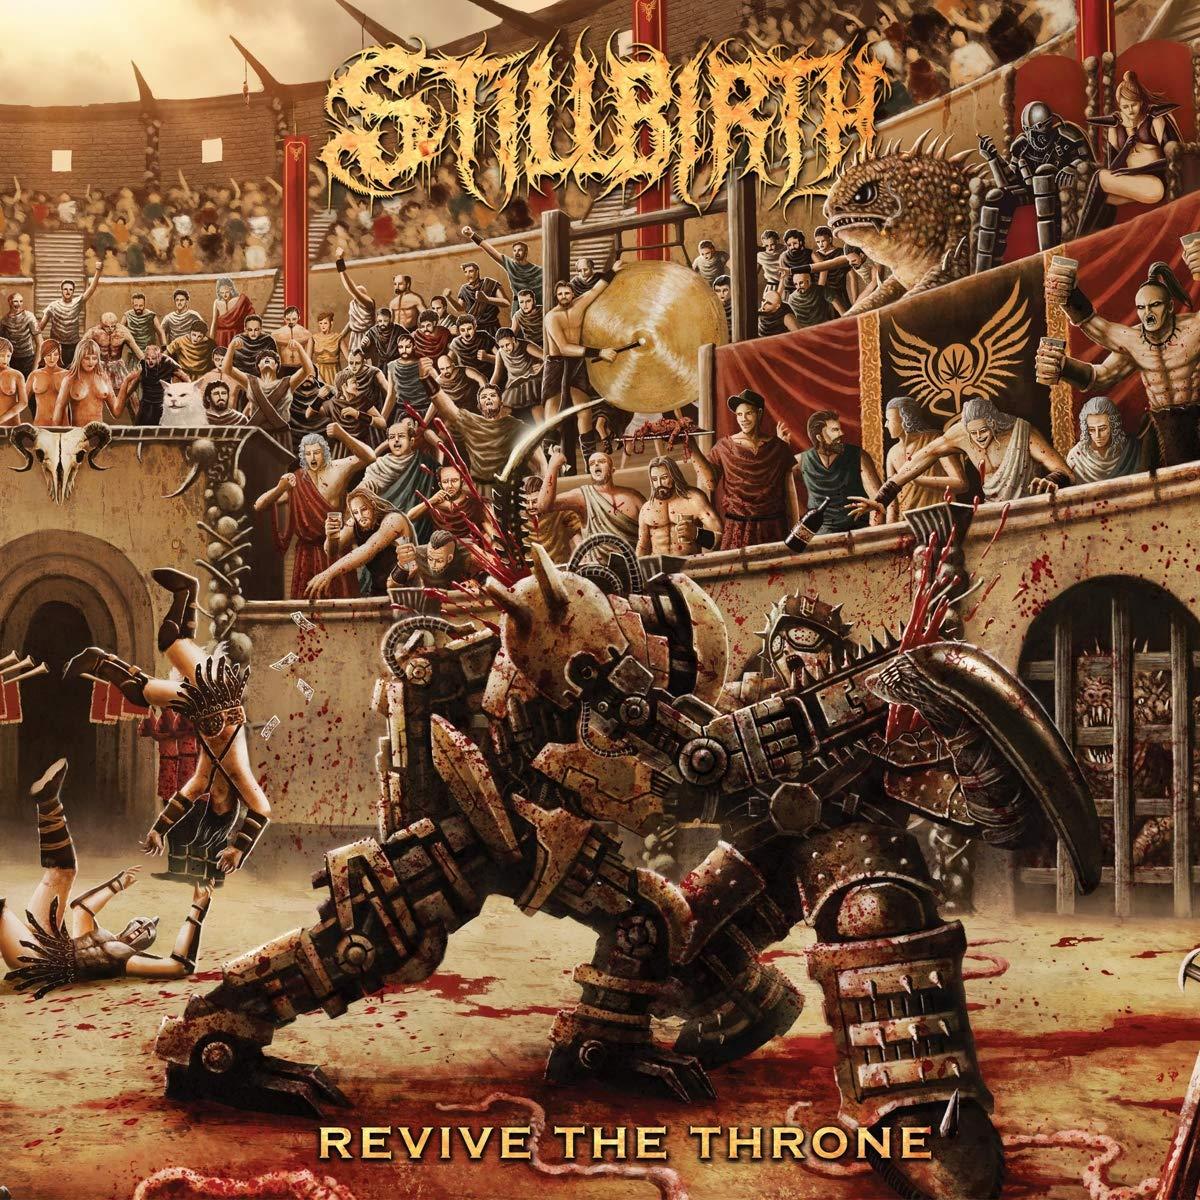 Stillbirth - Revive the Throne (2020) [FLAC] Download